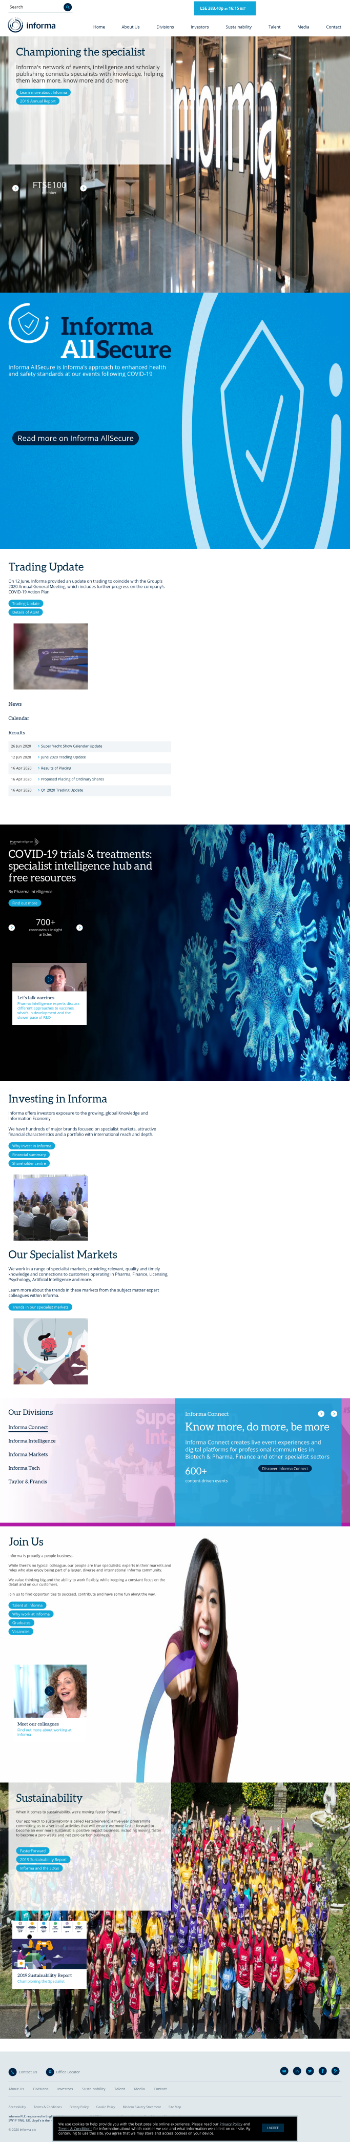 Informa plc Website Screenshot